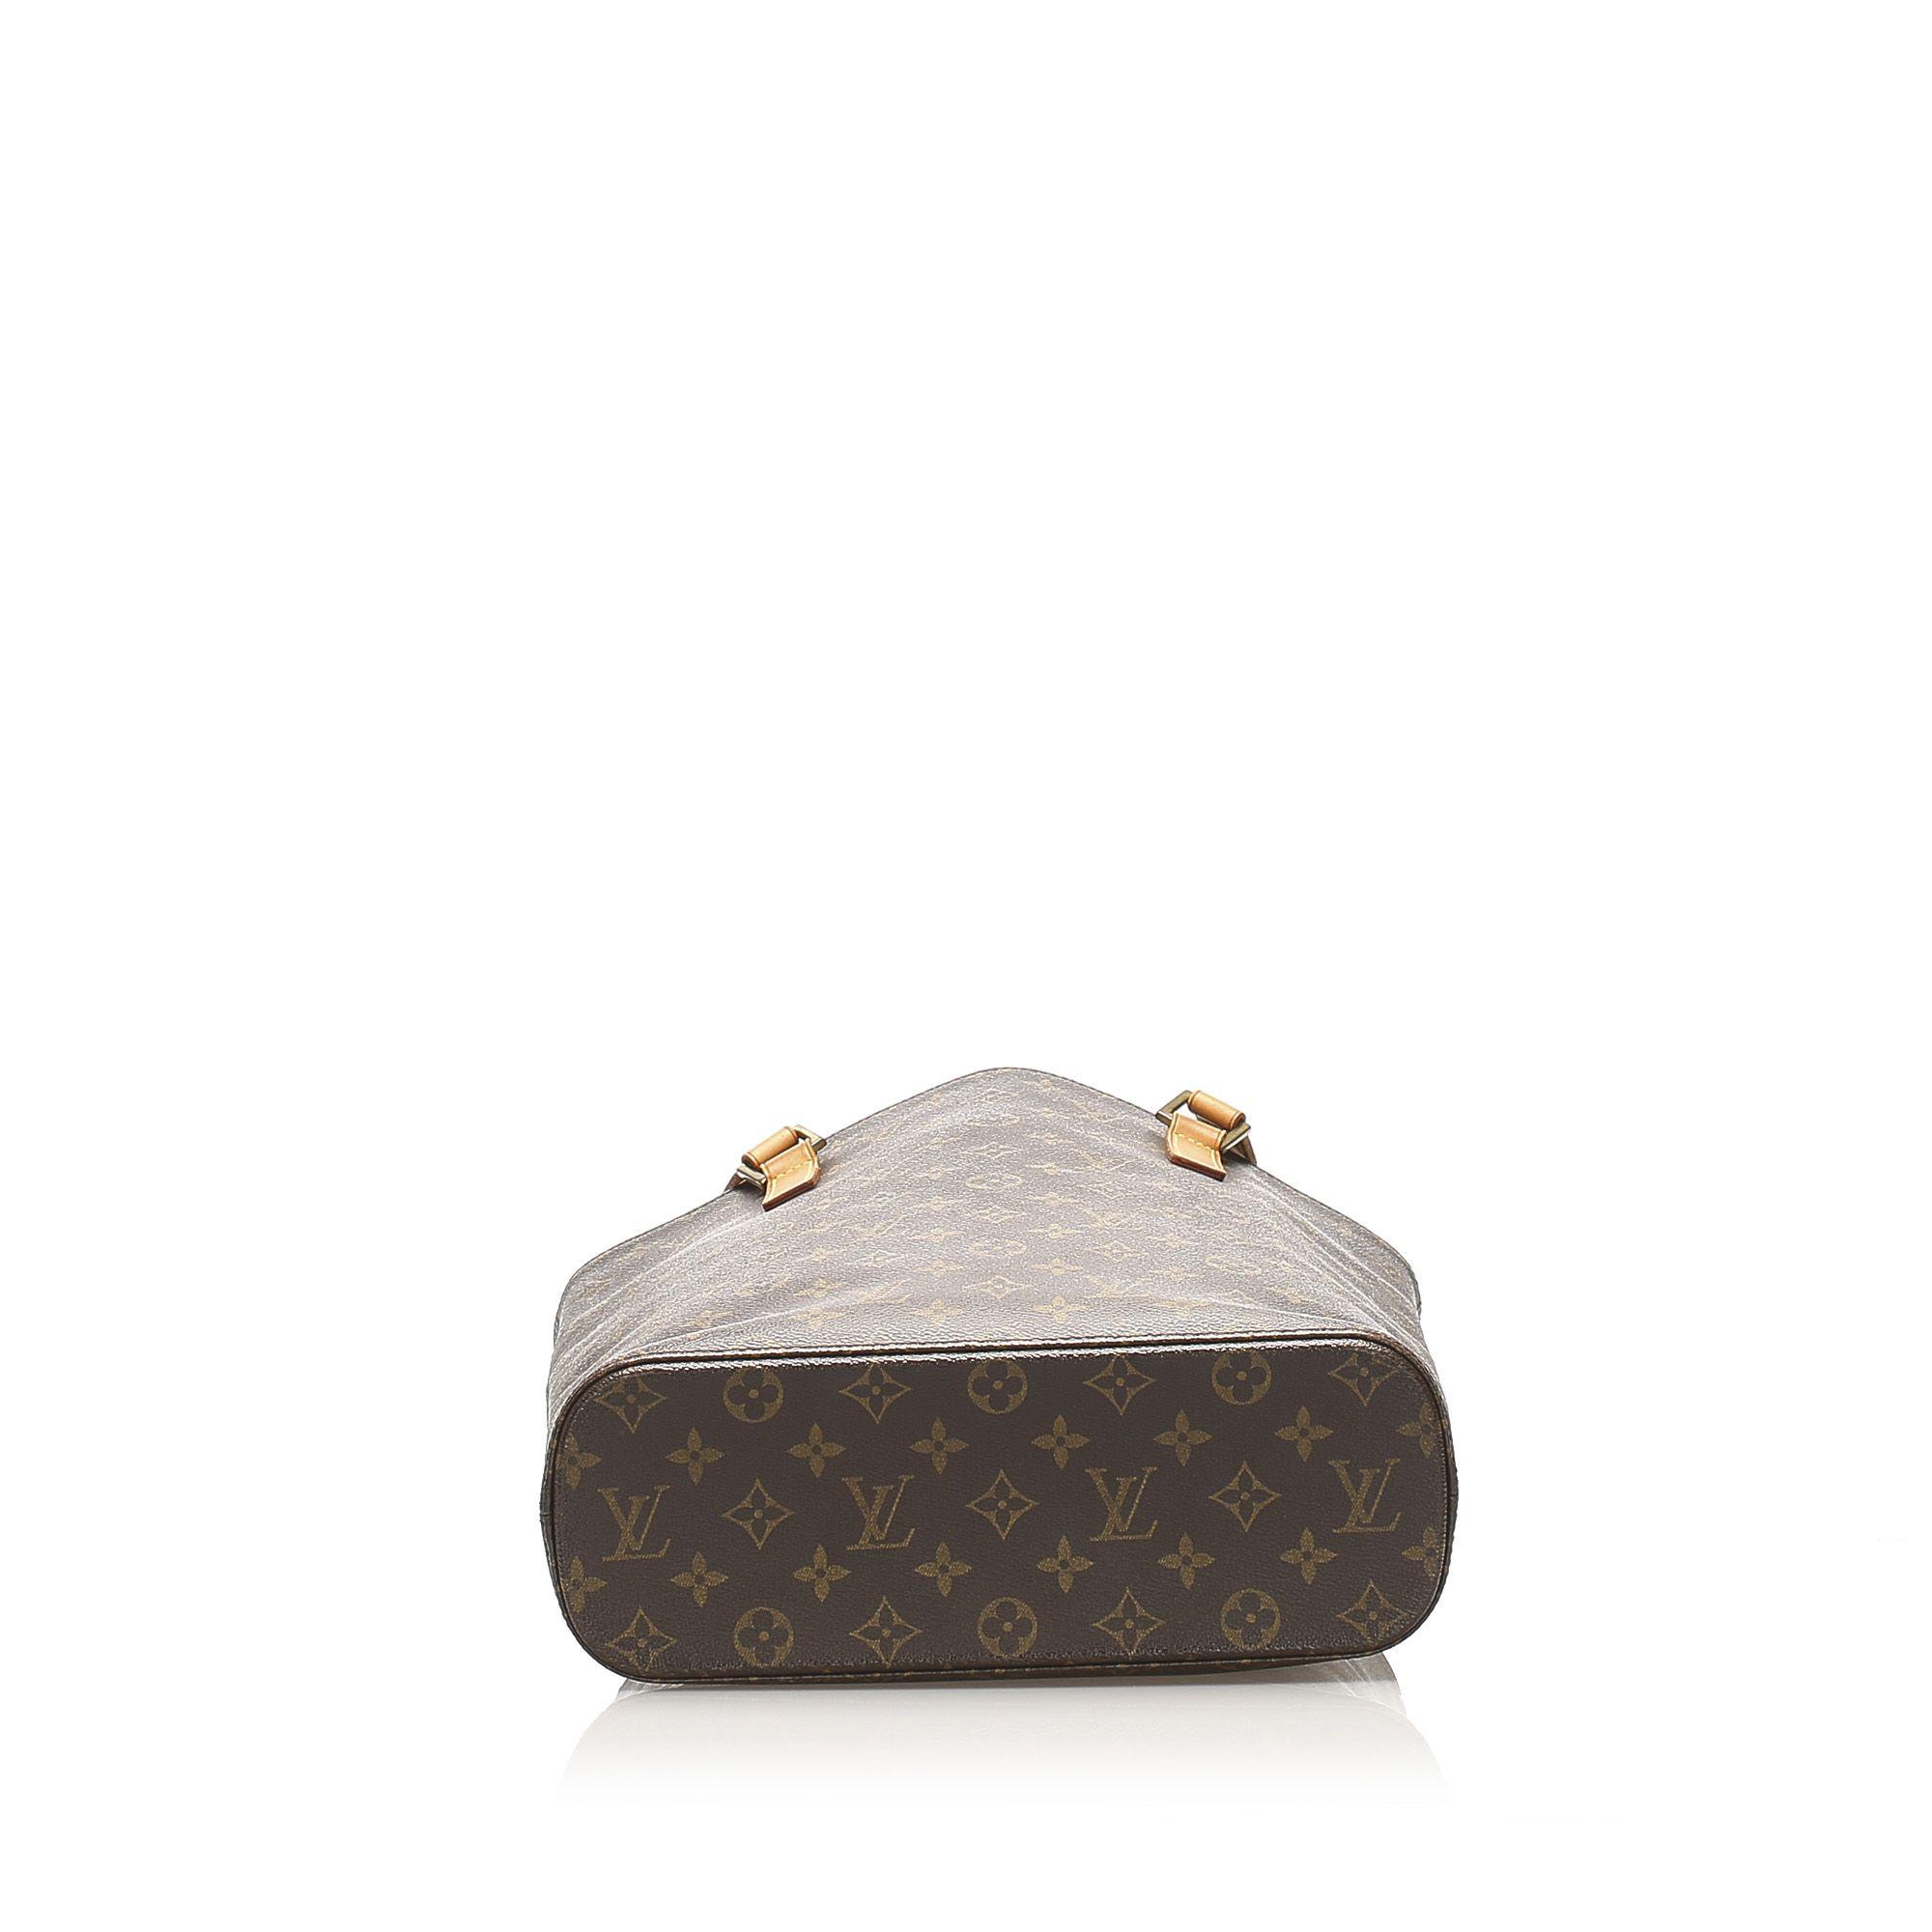 Vintage Louis Vuitton Monogram Vavin GM Brown